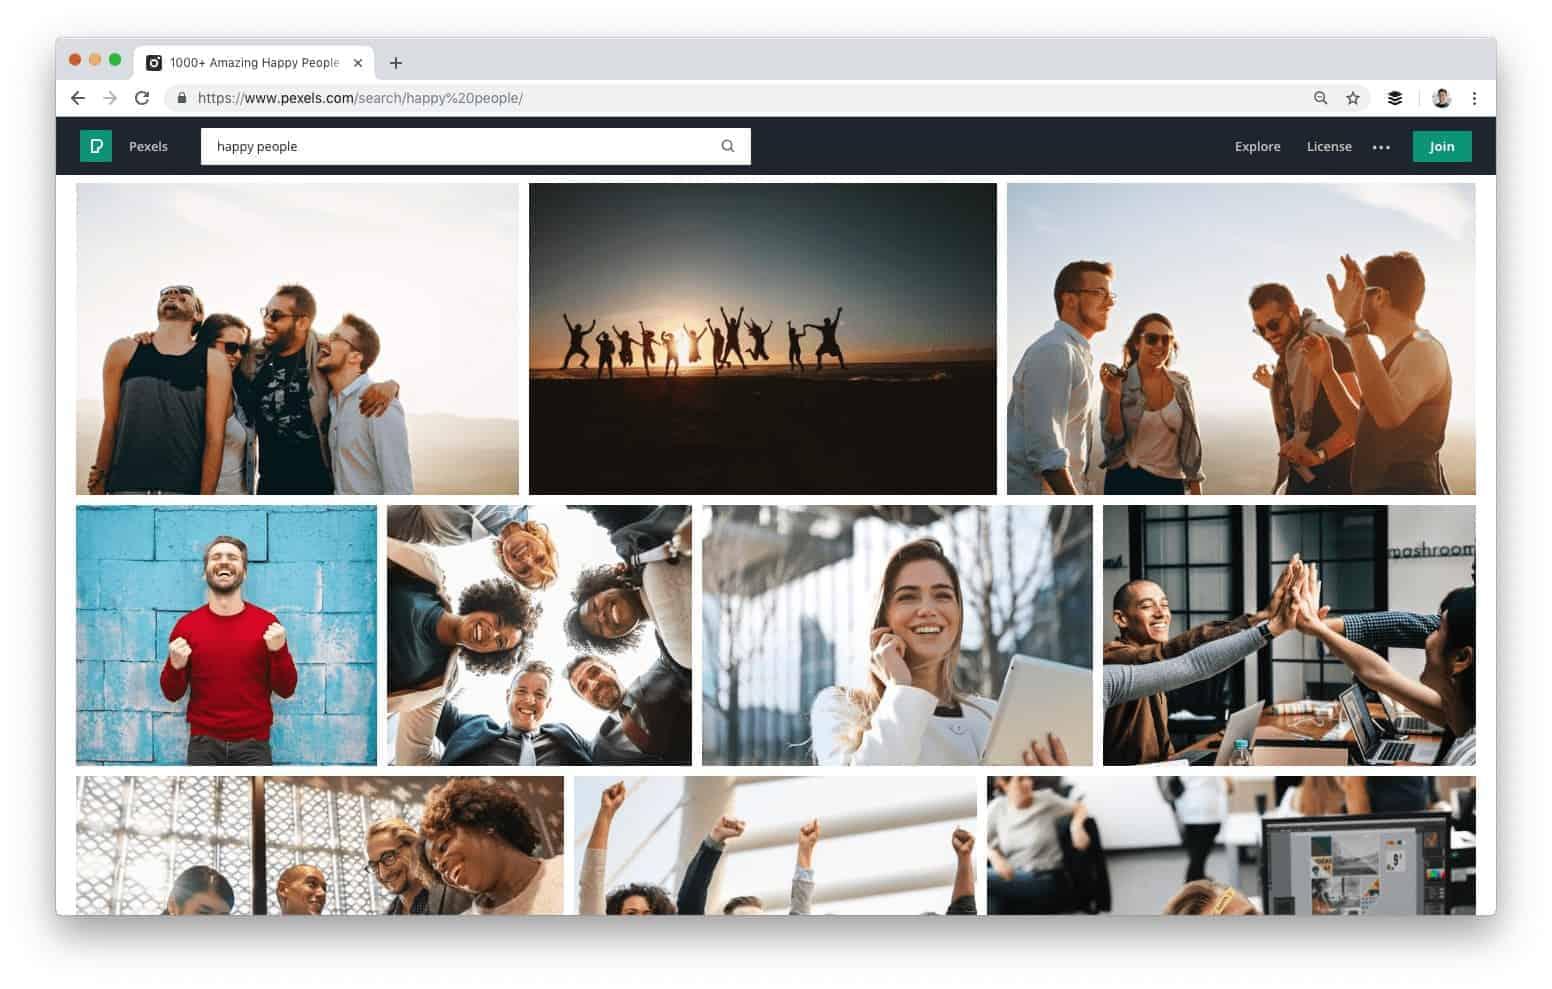 Pexels אתרי תמונות בחינם ללא זכויות יוצרים